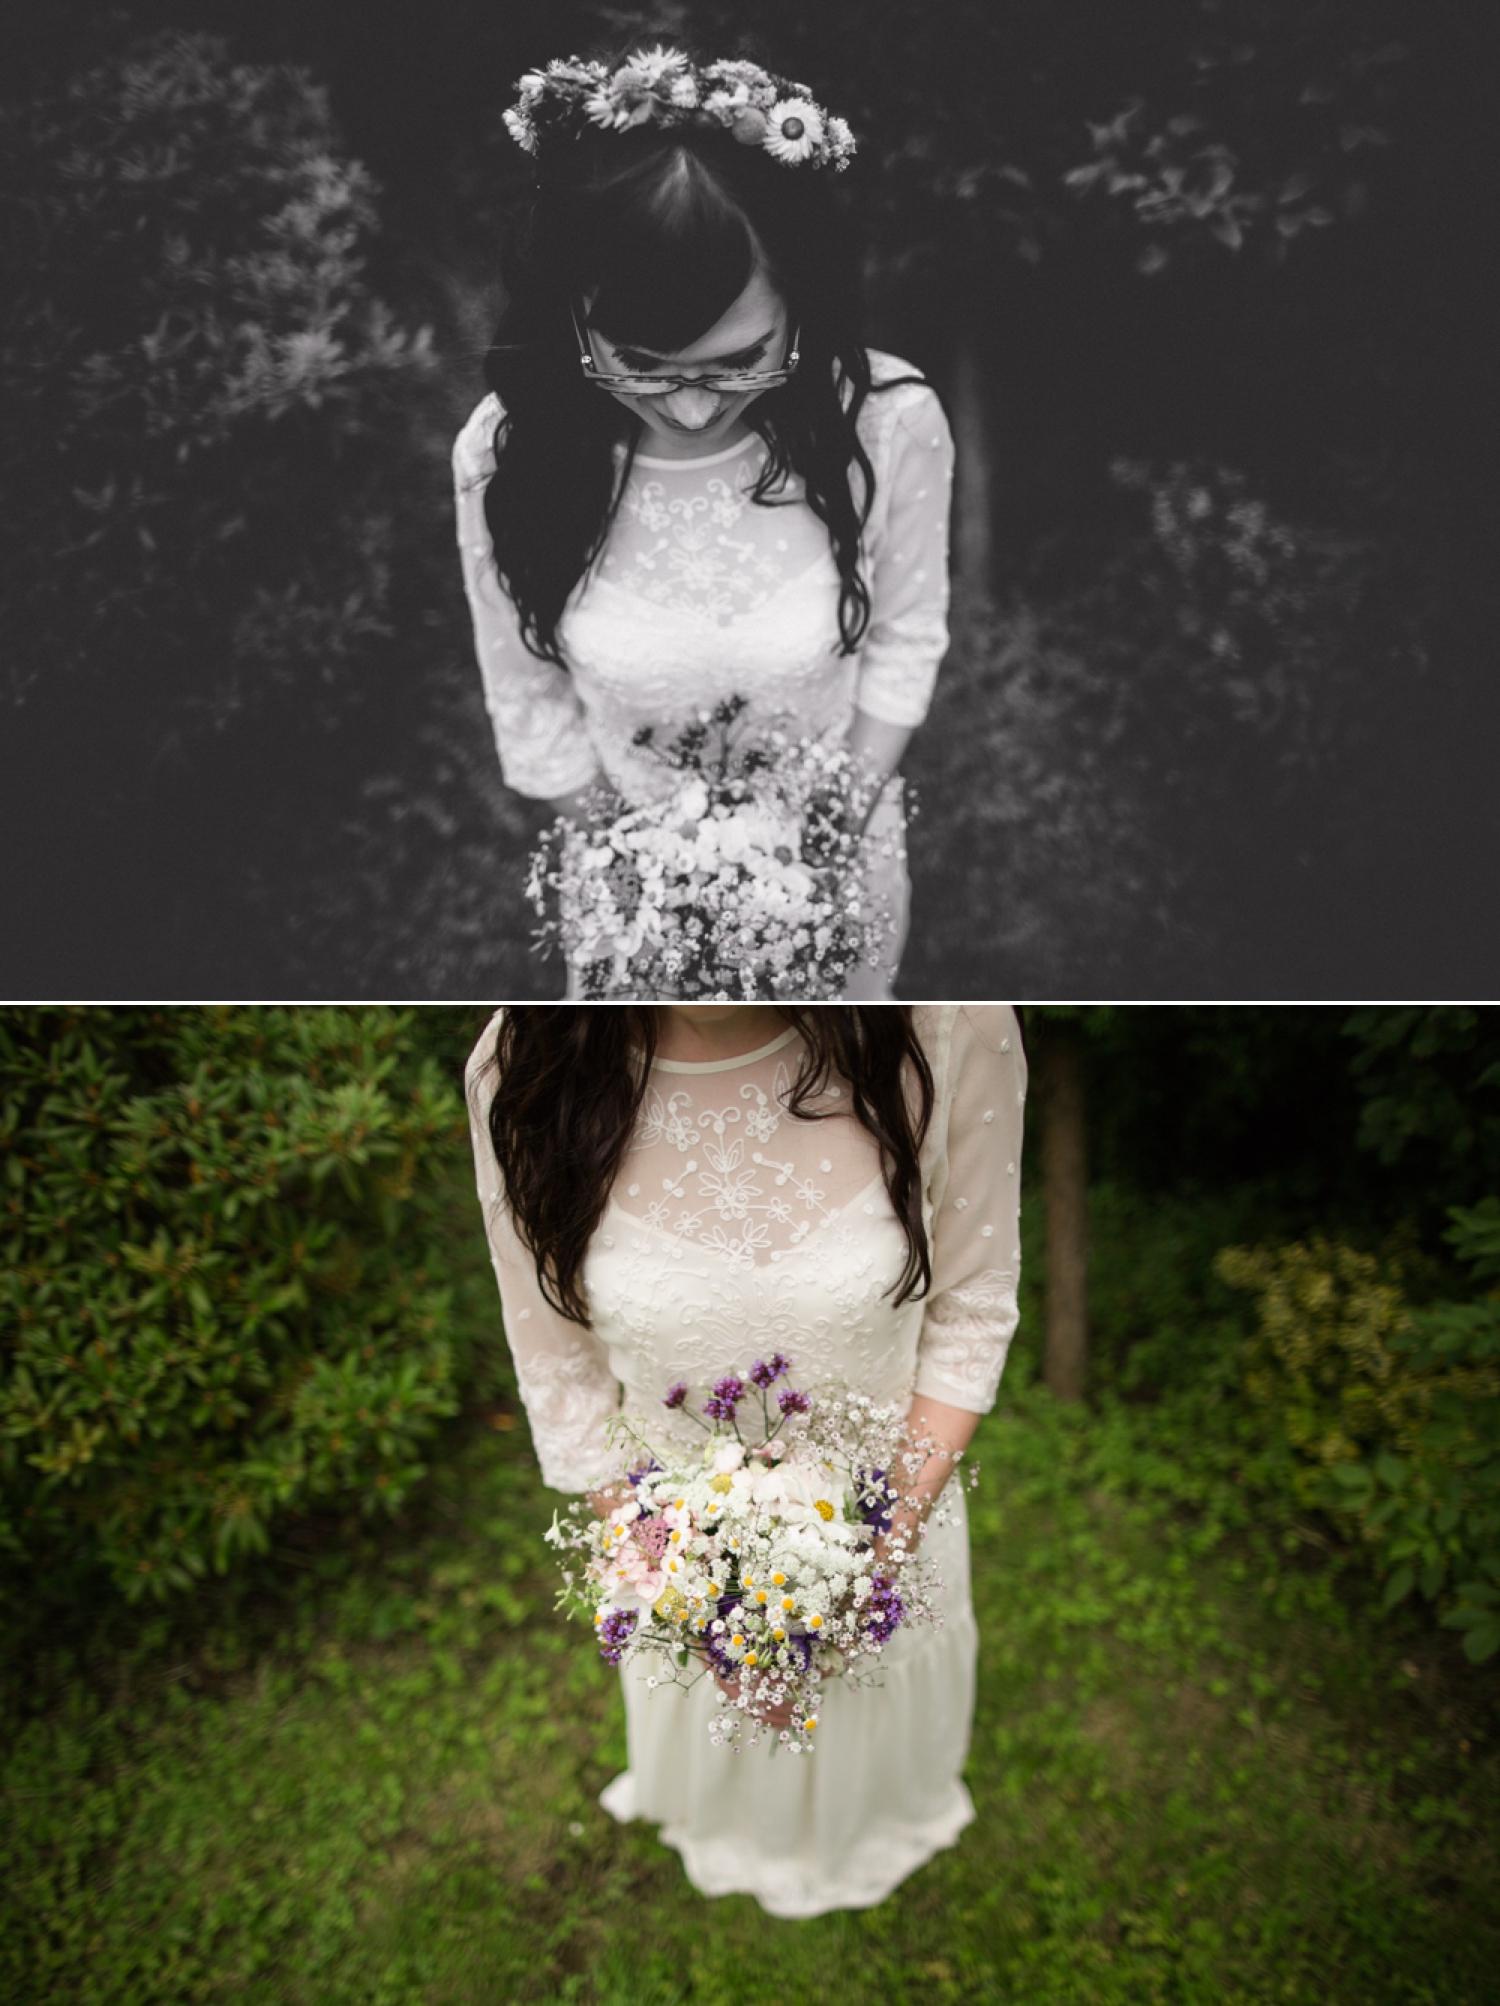 Cheshire Wedding Photographer Elly & Liam_0012